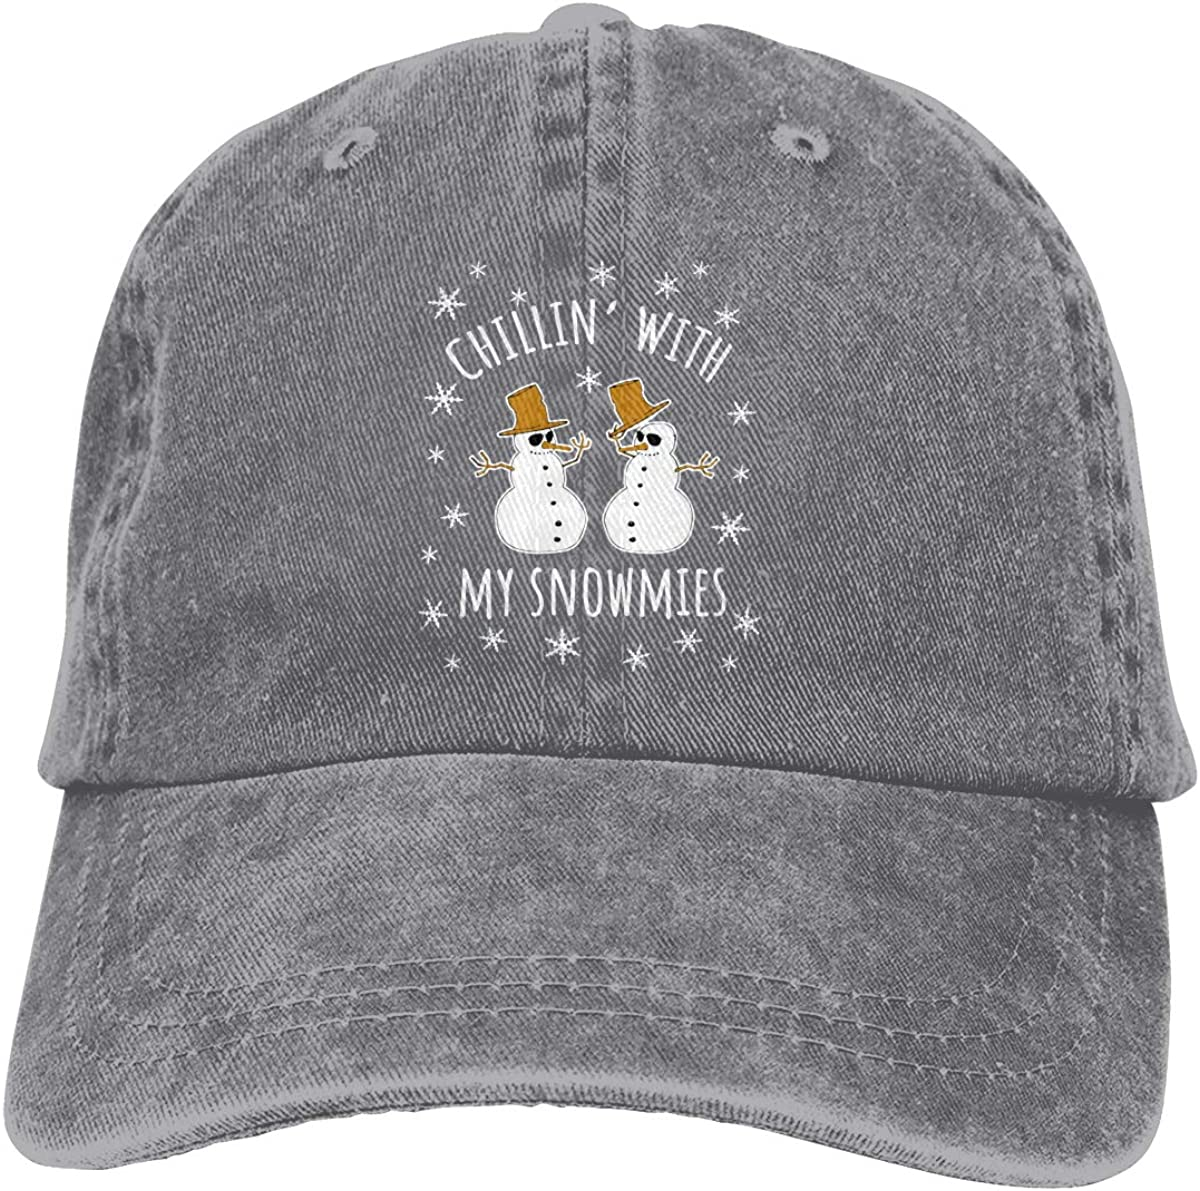 Vbfgtg Chillin with My Snowmies Denim Hats Washed Retro Baseball Cap Dad Hat